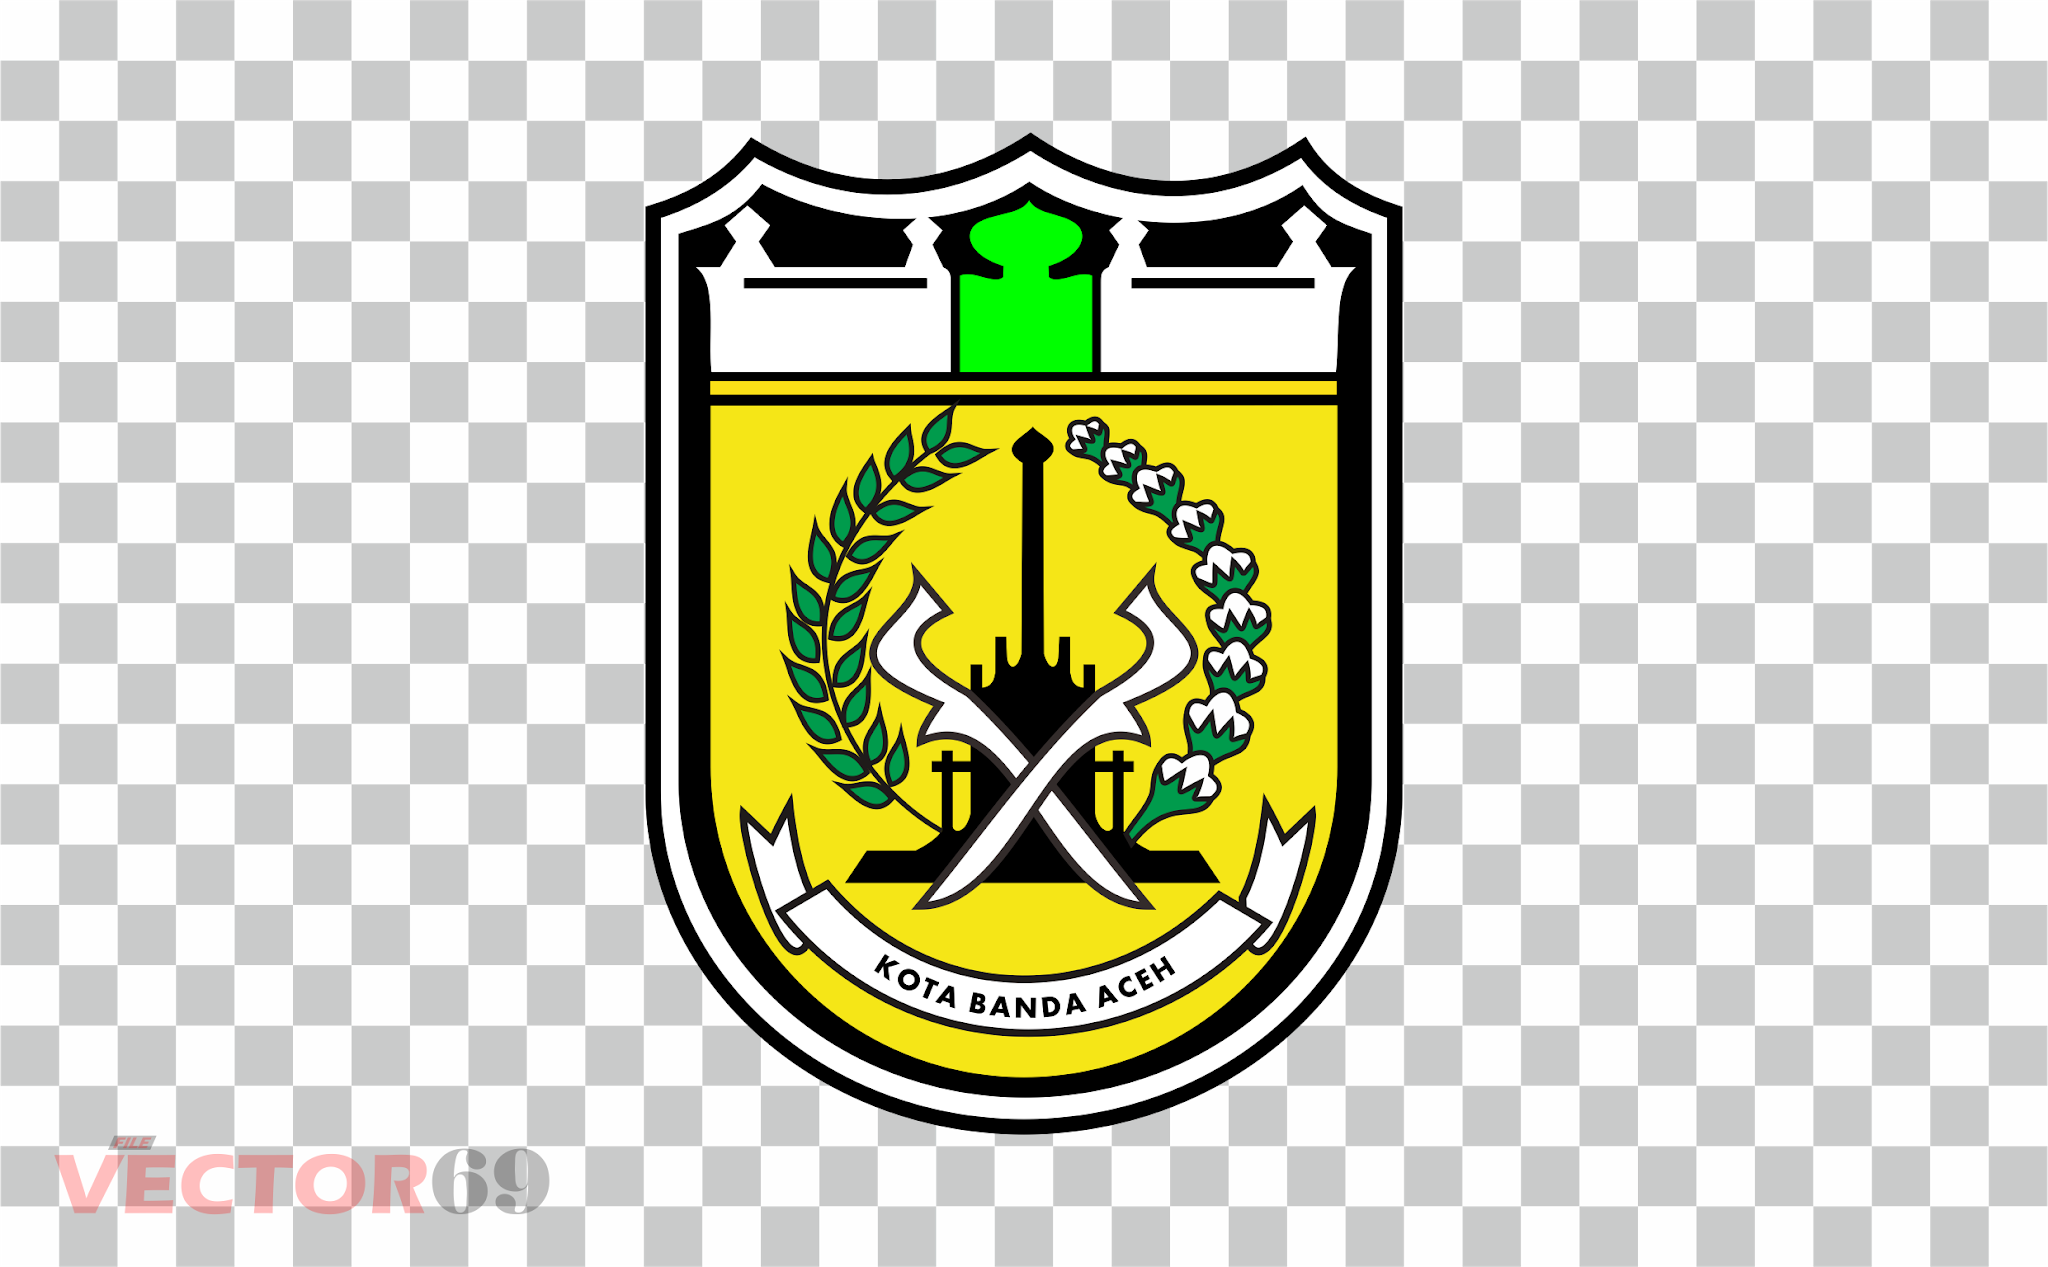 Kota Banda Aceh Logo - Download Vector File PNG (Portable Network Graphics)